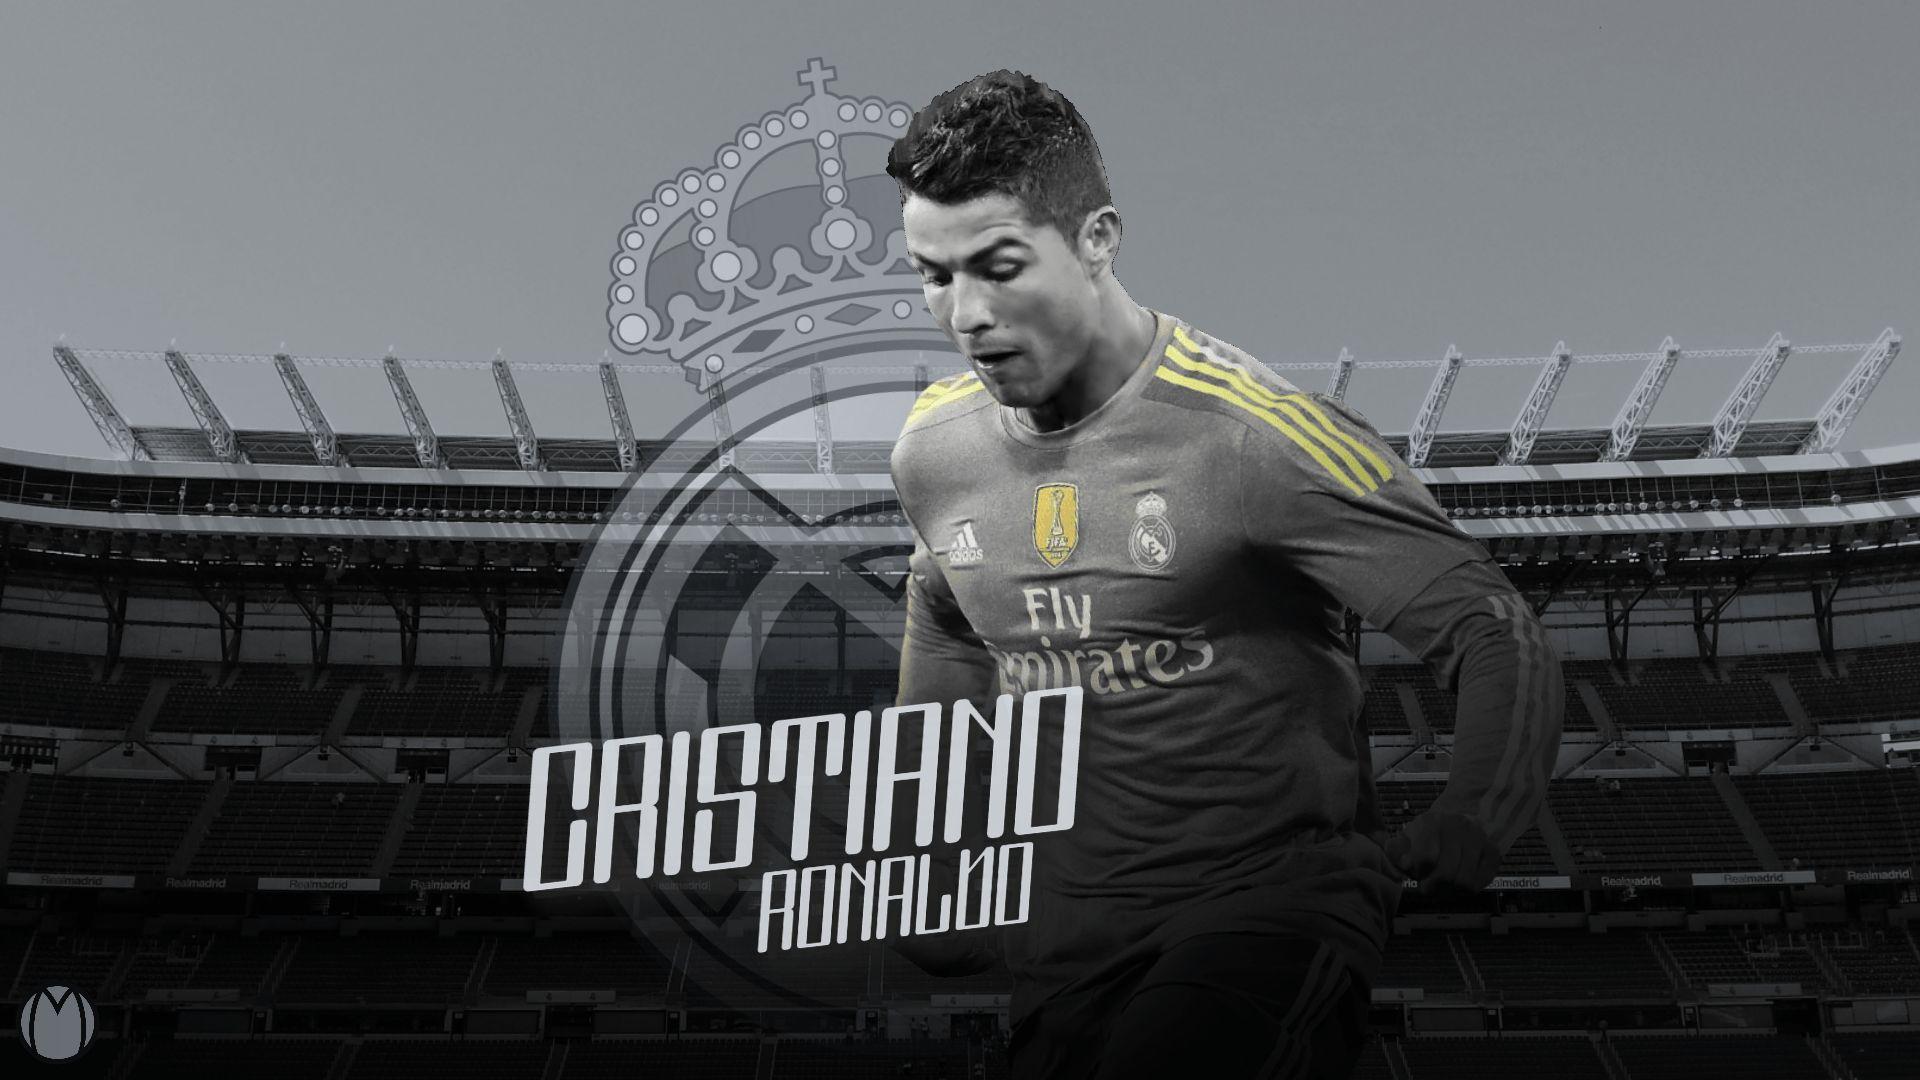 Ronaldo Wallpapers